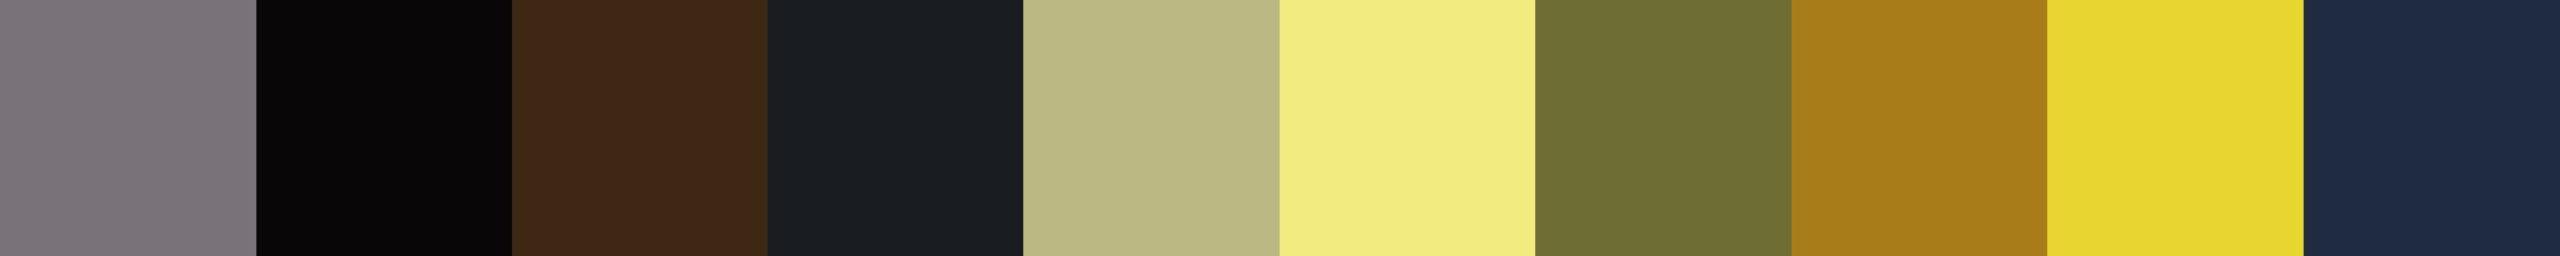 713 Saremaga Color Palette